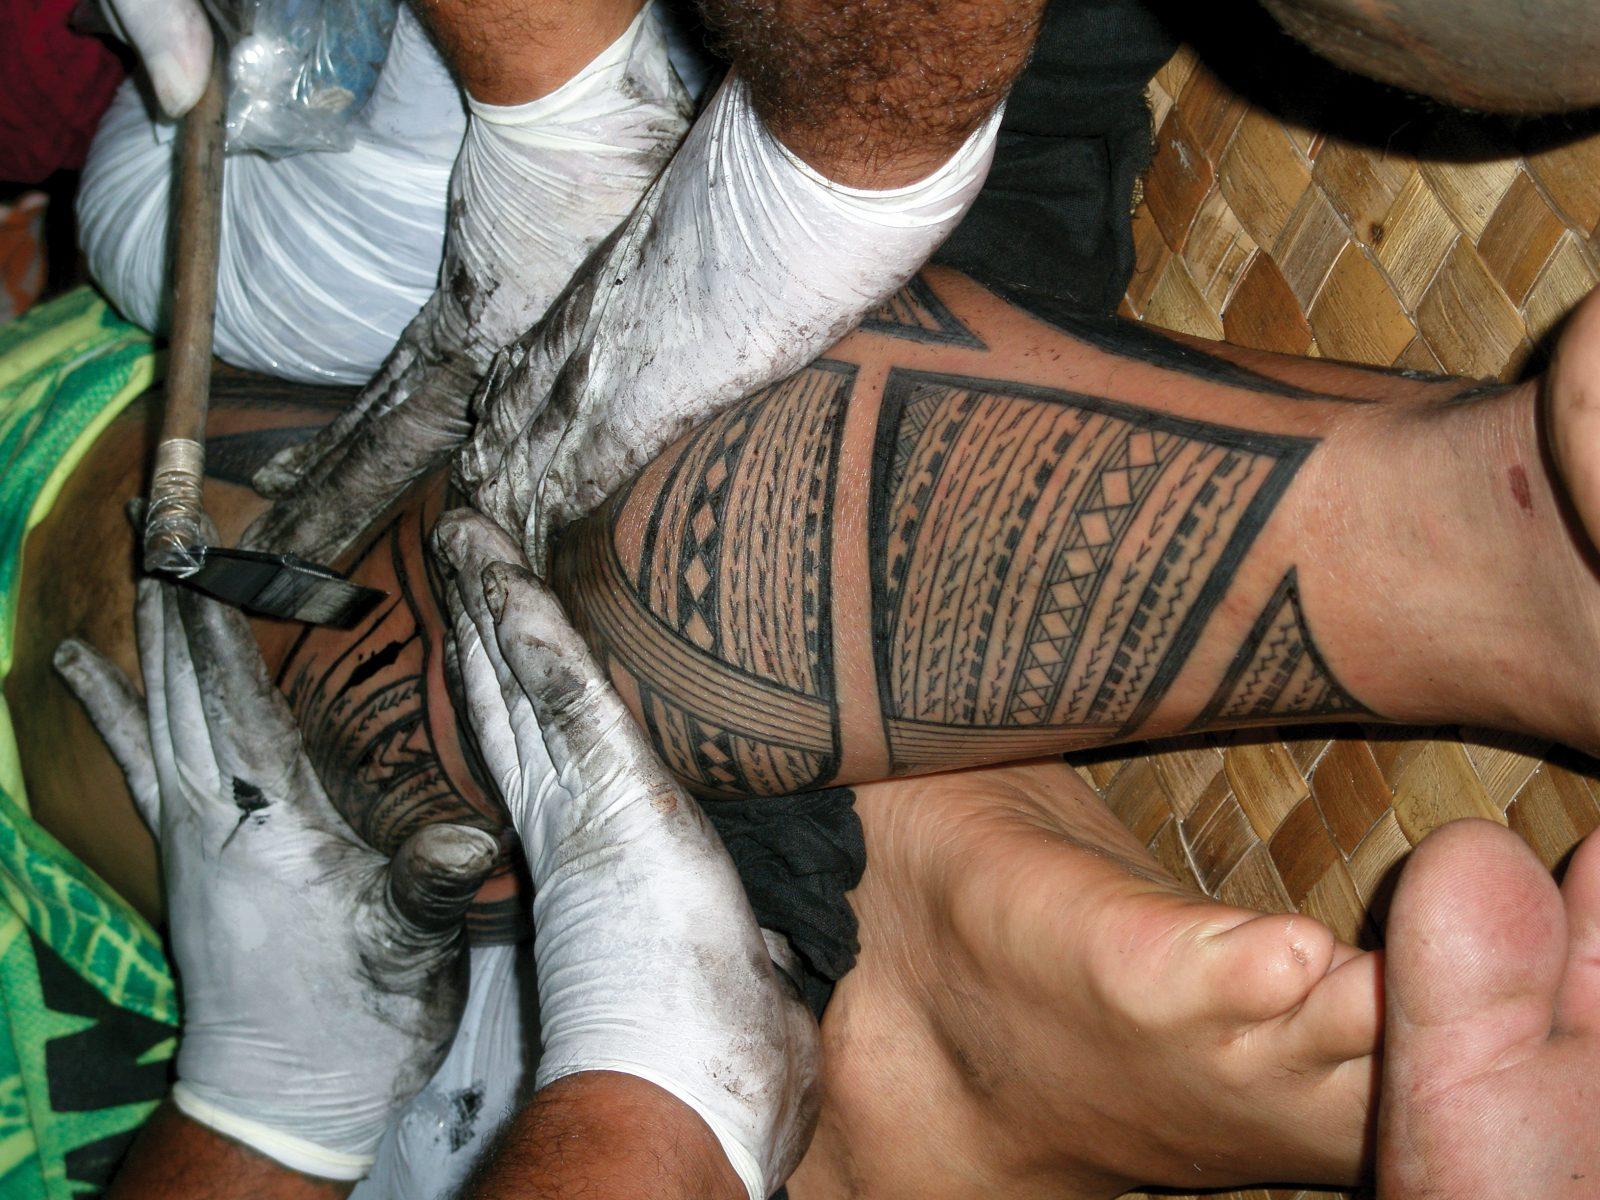 Tattoos sleeves tattoo designs for wrist latin quotes phrase tattoo design tatto